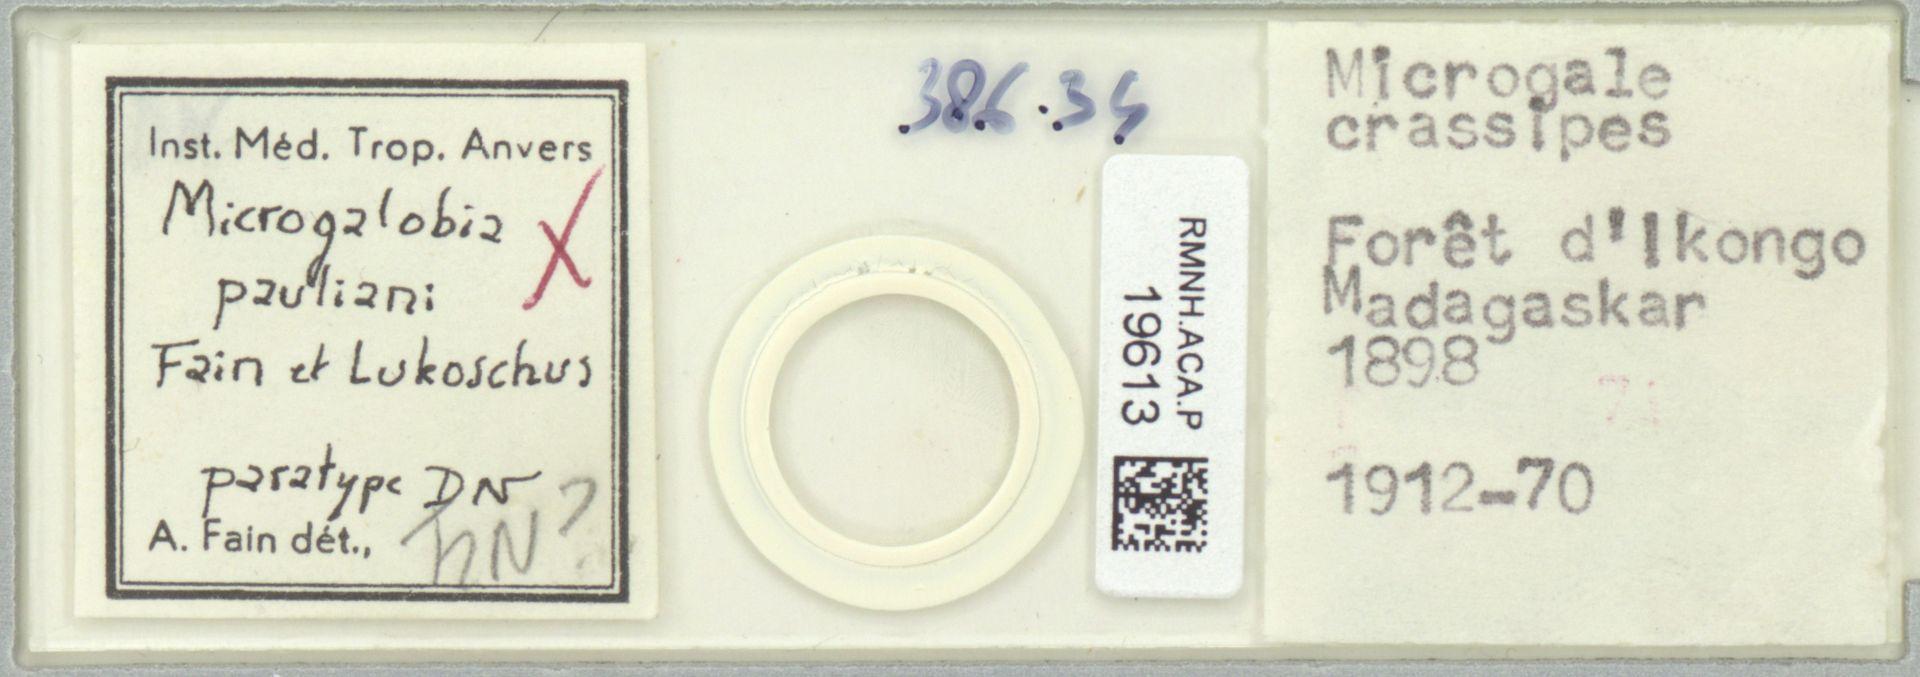 RMNH.ACA.P.19613   Microgalobia pauliani